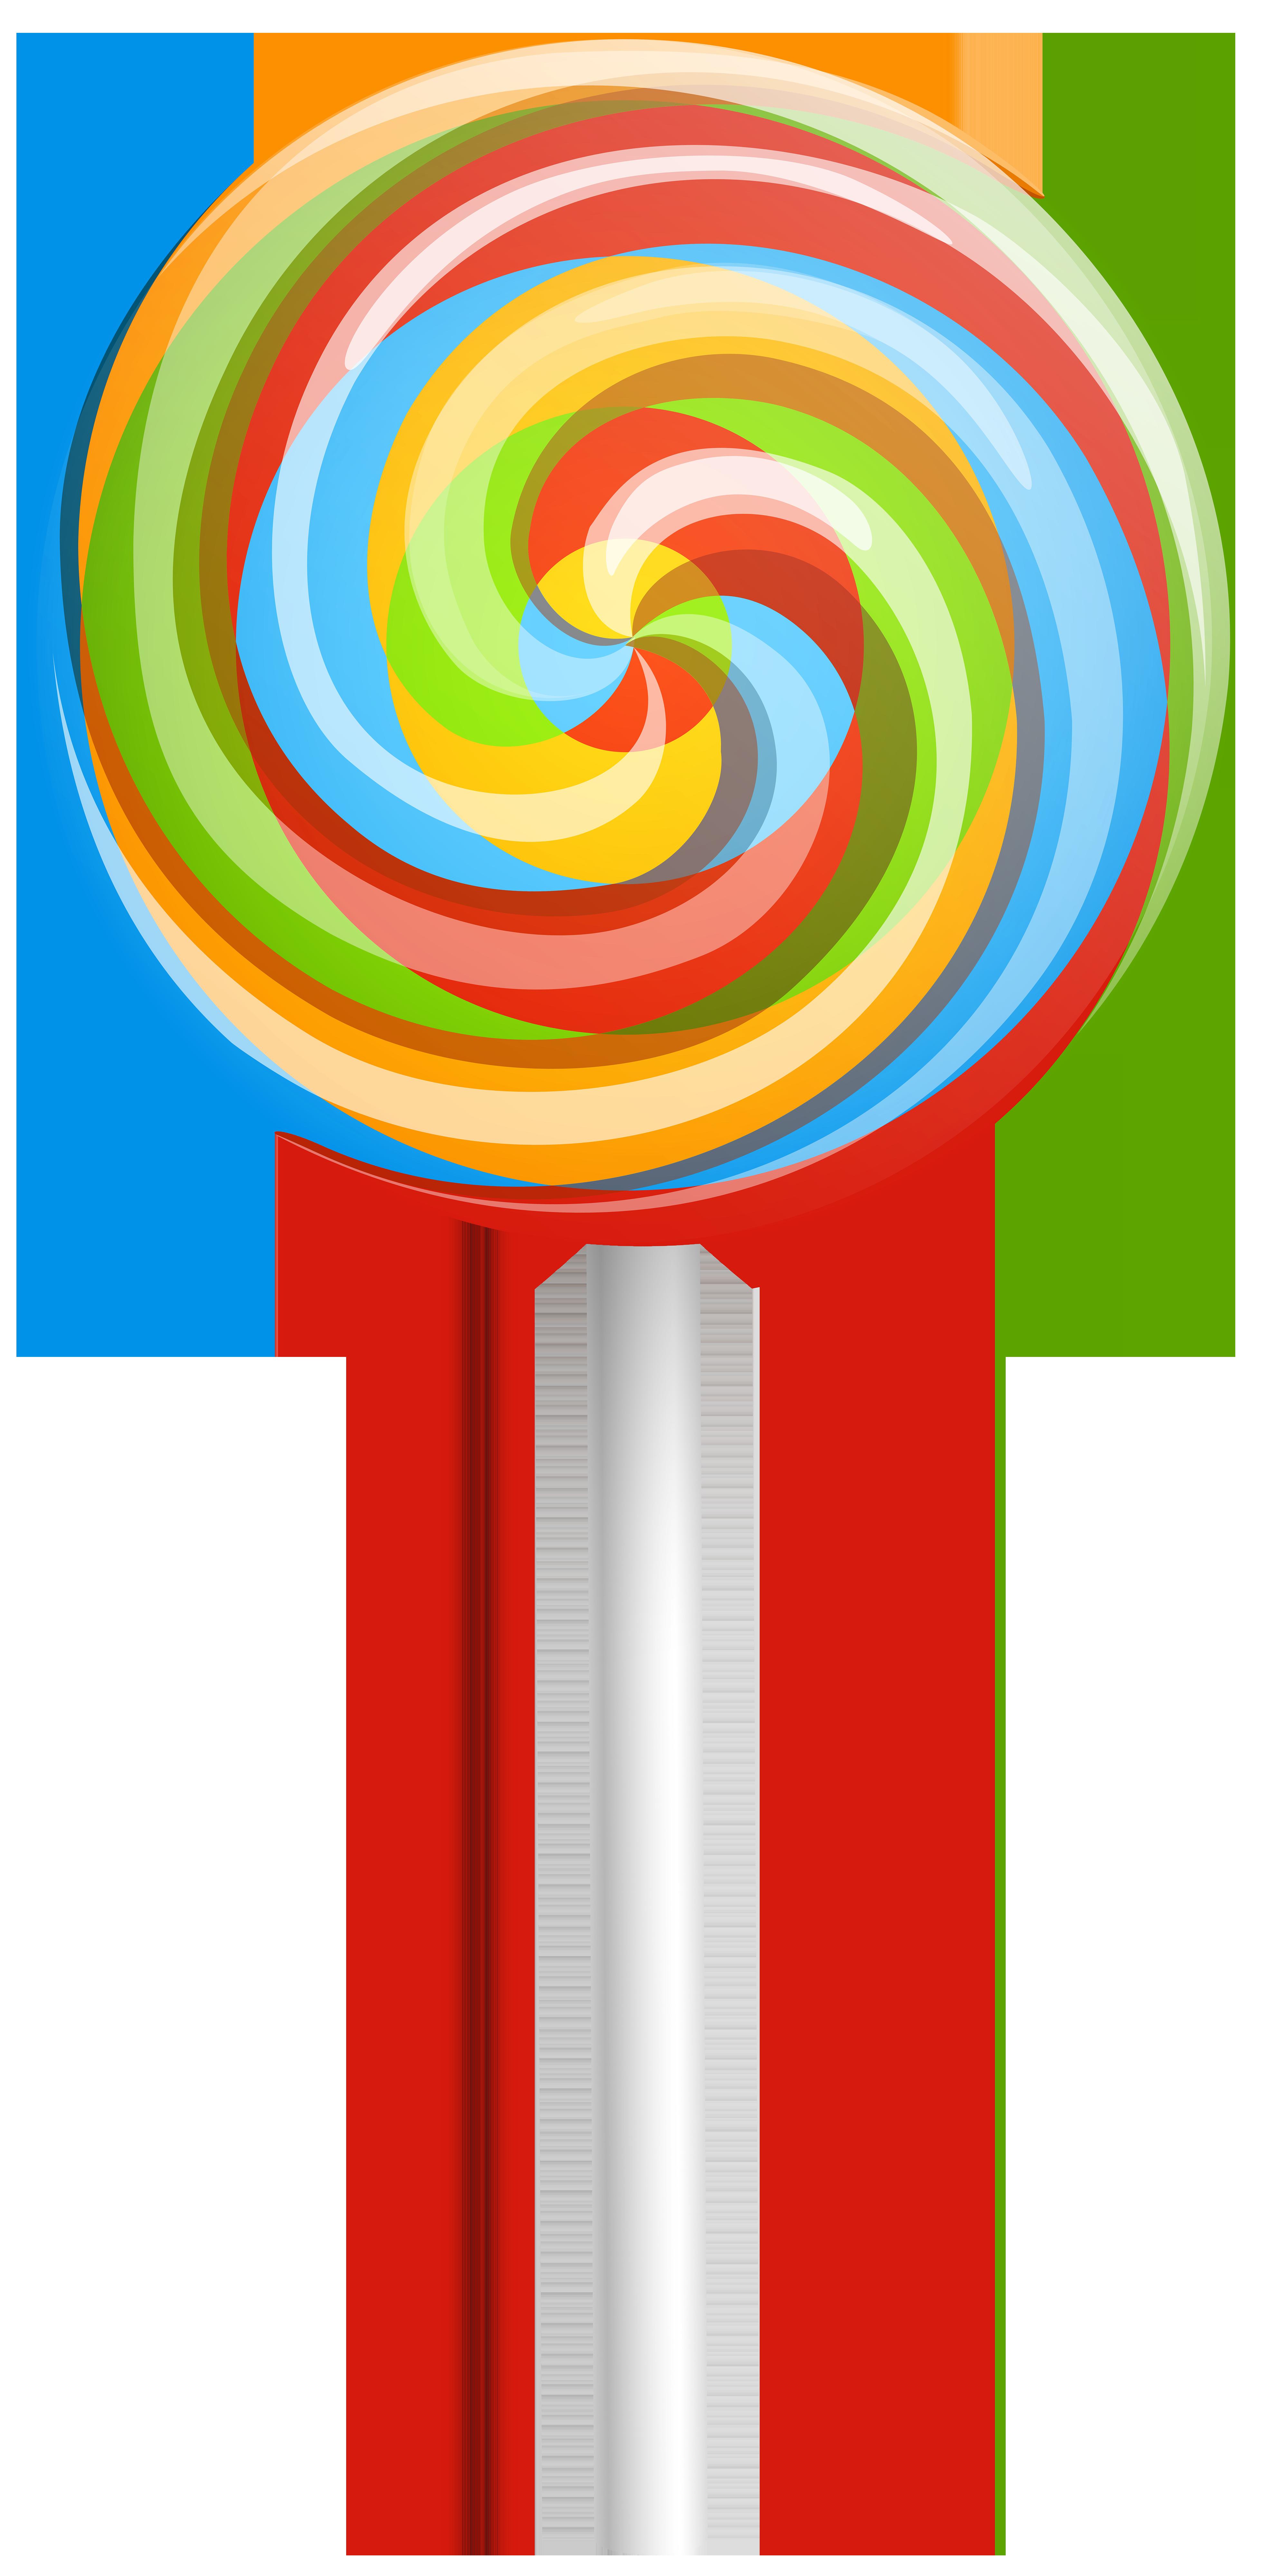 Halloween lollipops clipart image free stock Rainbow Swirl Lollipop PNG Clip Art Image | Gallery Yopriceville ... image free stock